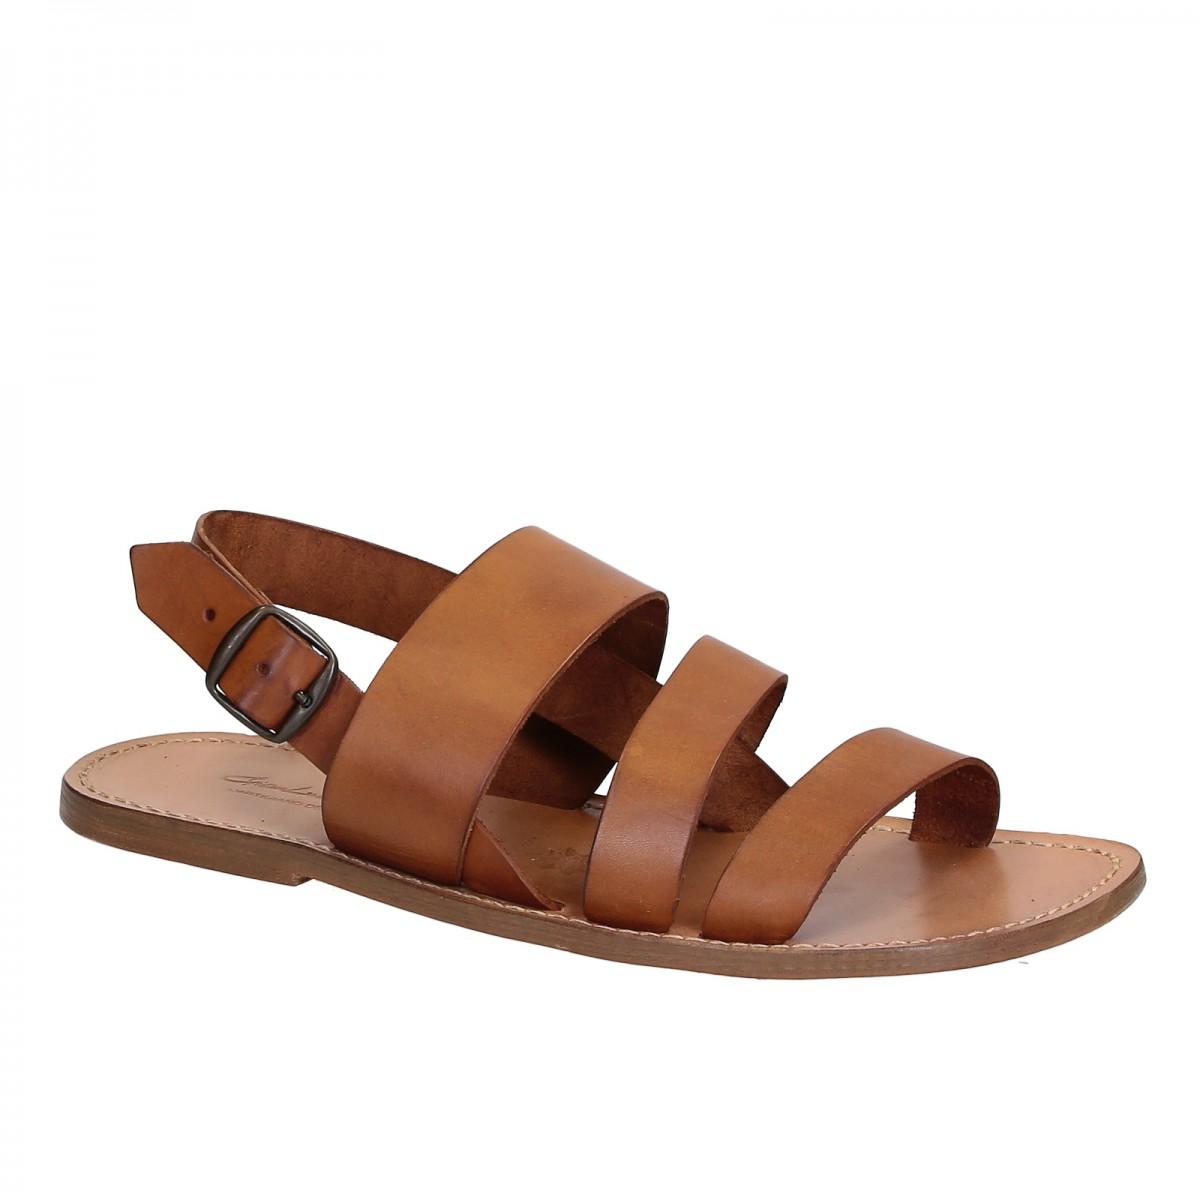 Tan leather sandals handmade in Italy for men's | Gianluca ...